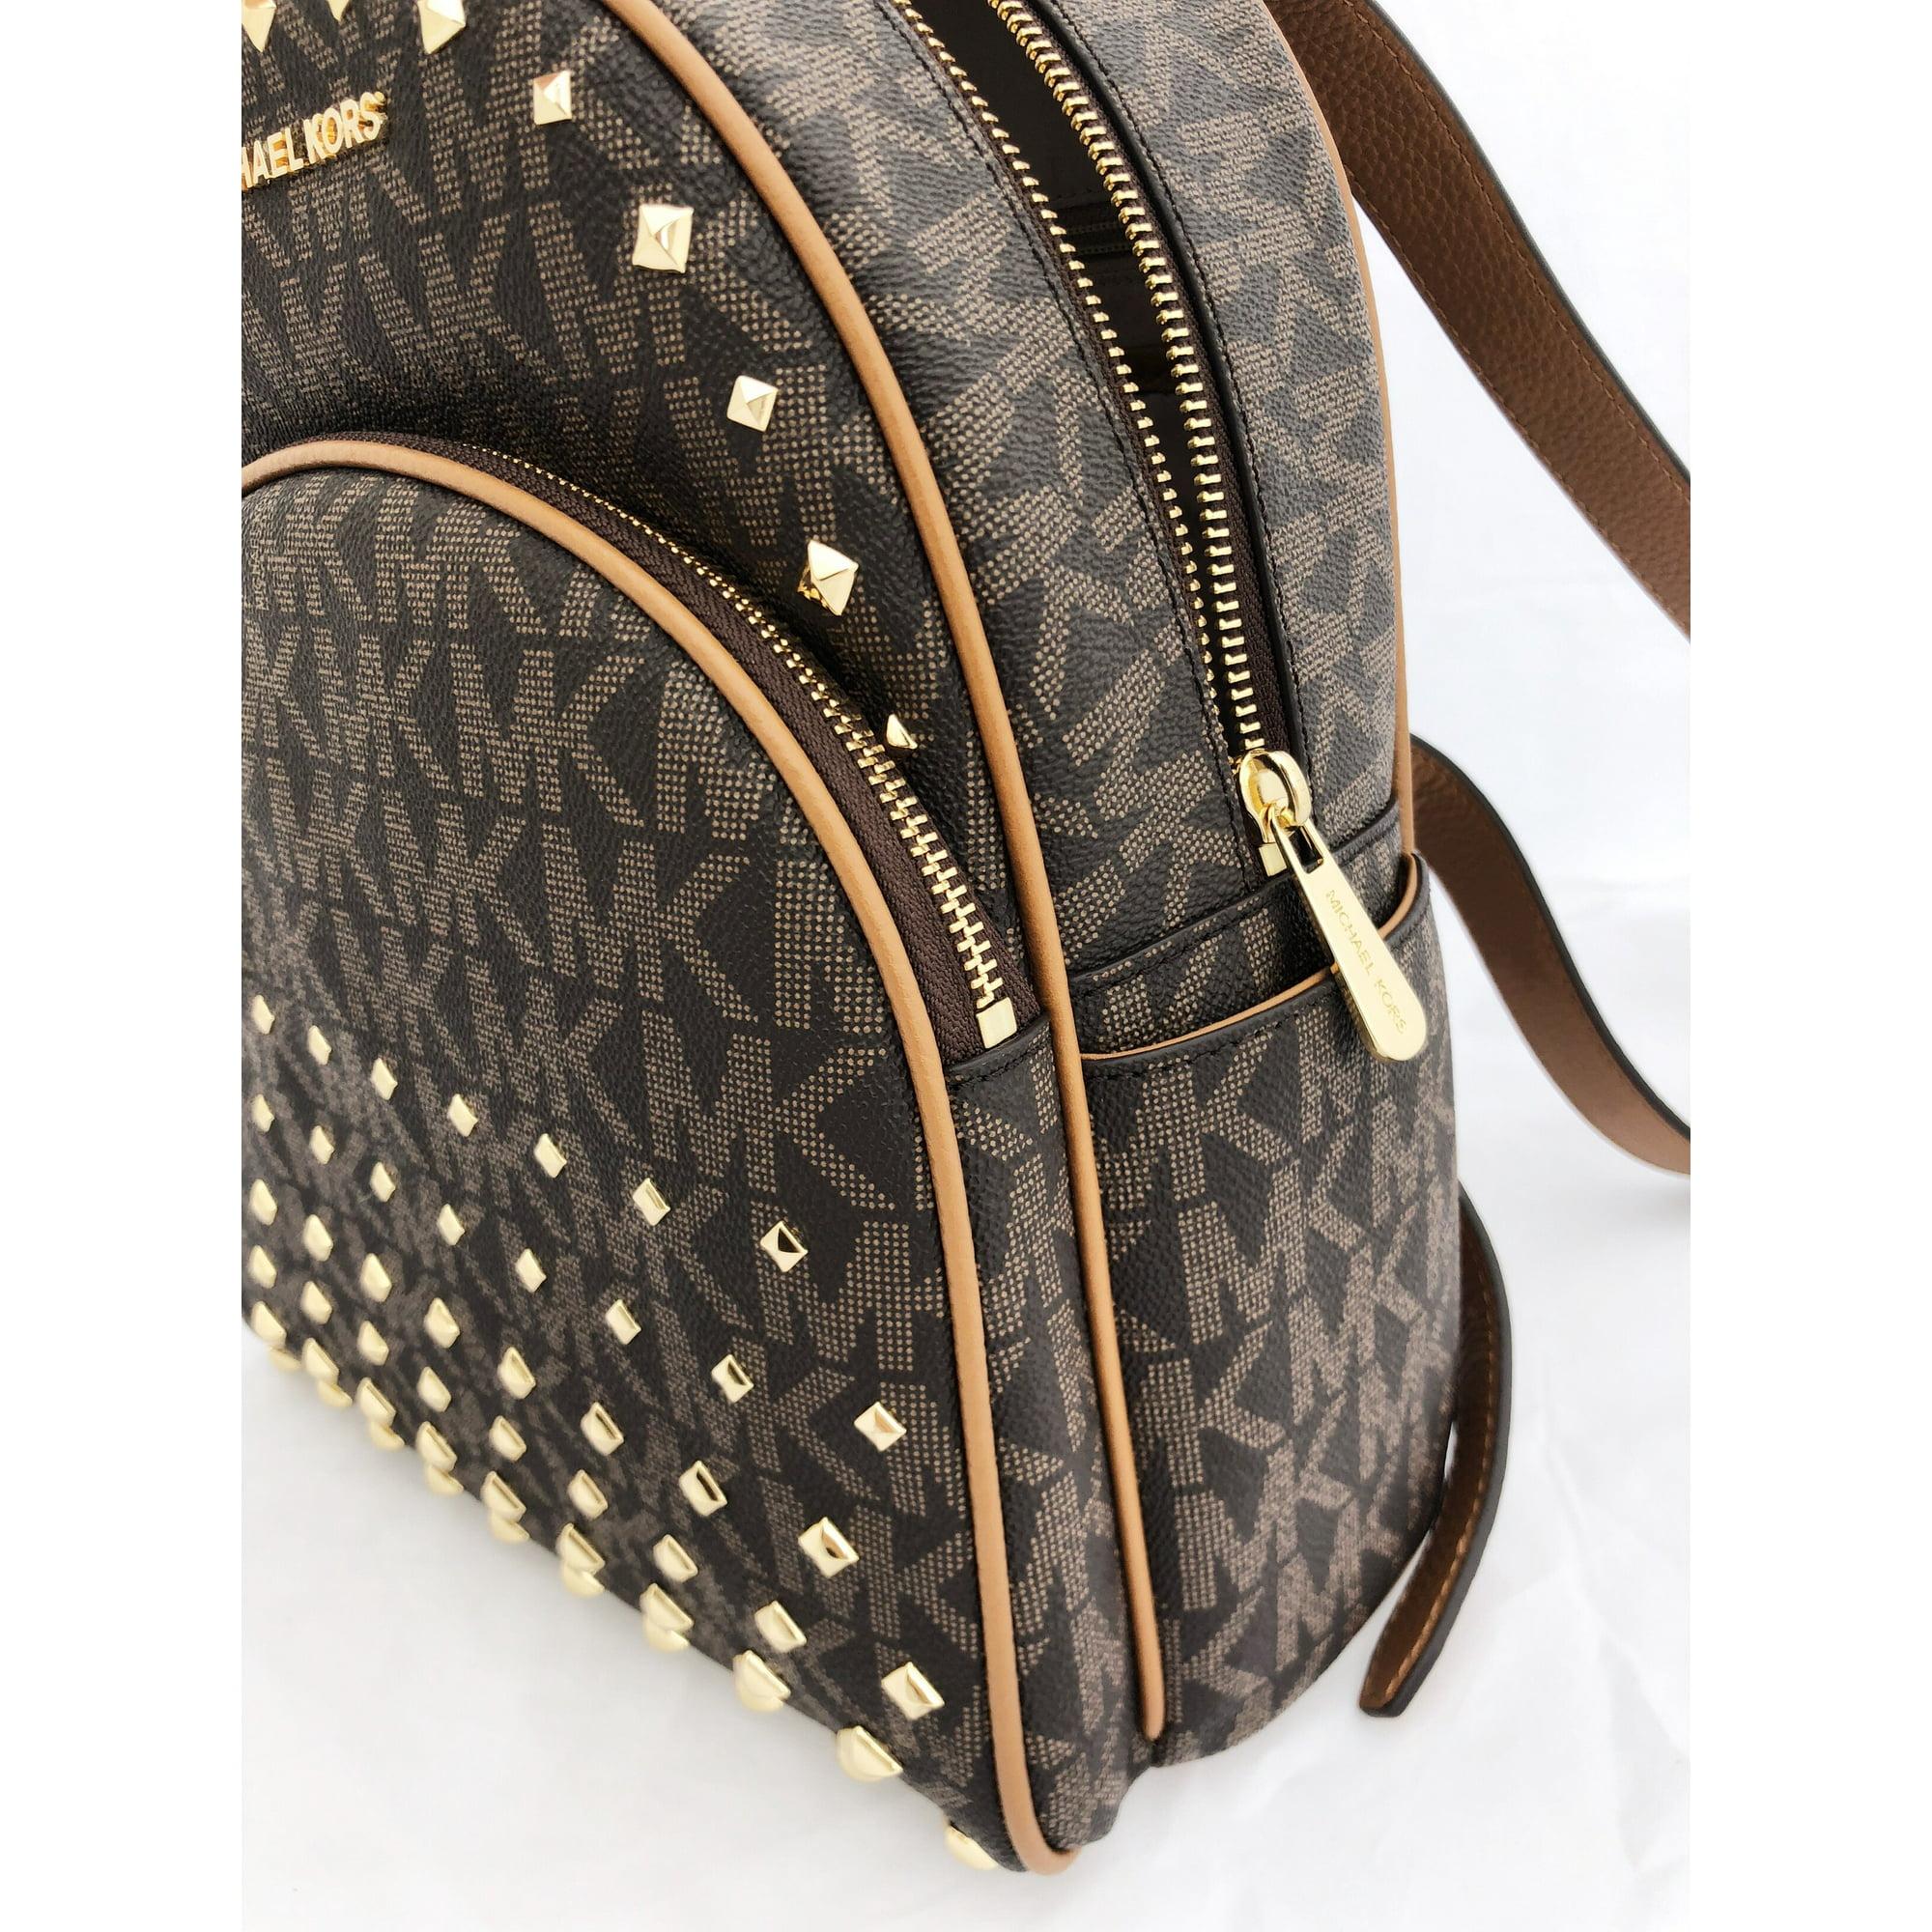 56d3a6bb743c Buy Michael Kors Abbey Medium Backpack Brown MK Signature Stud Acorn ...